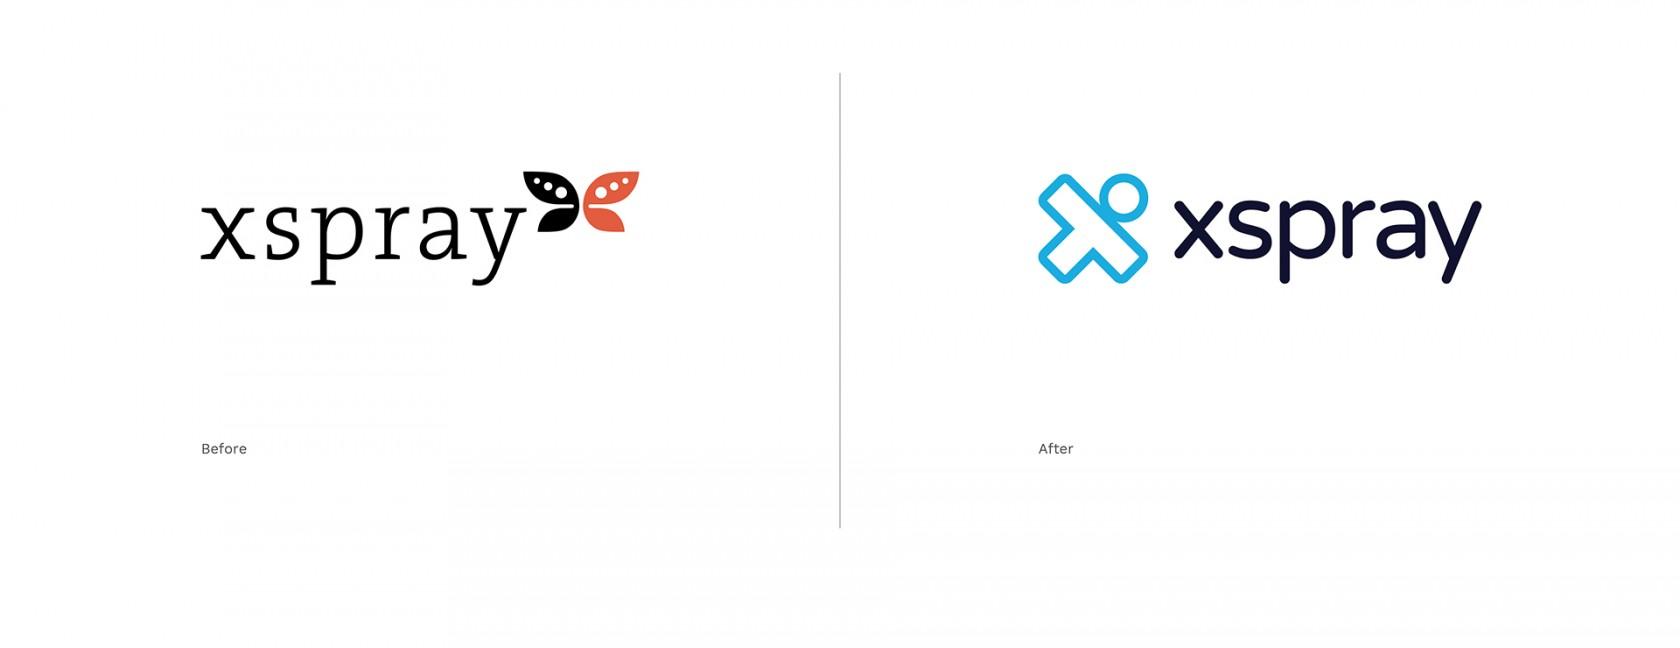 Xspray rebranding